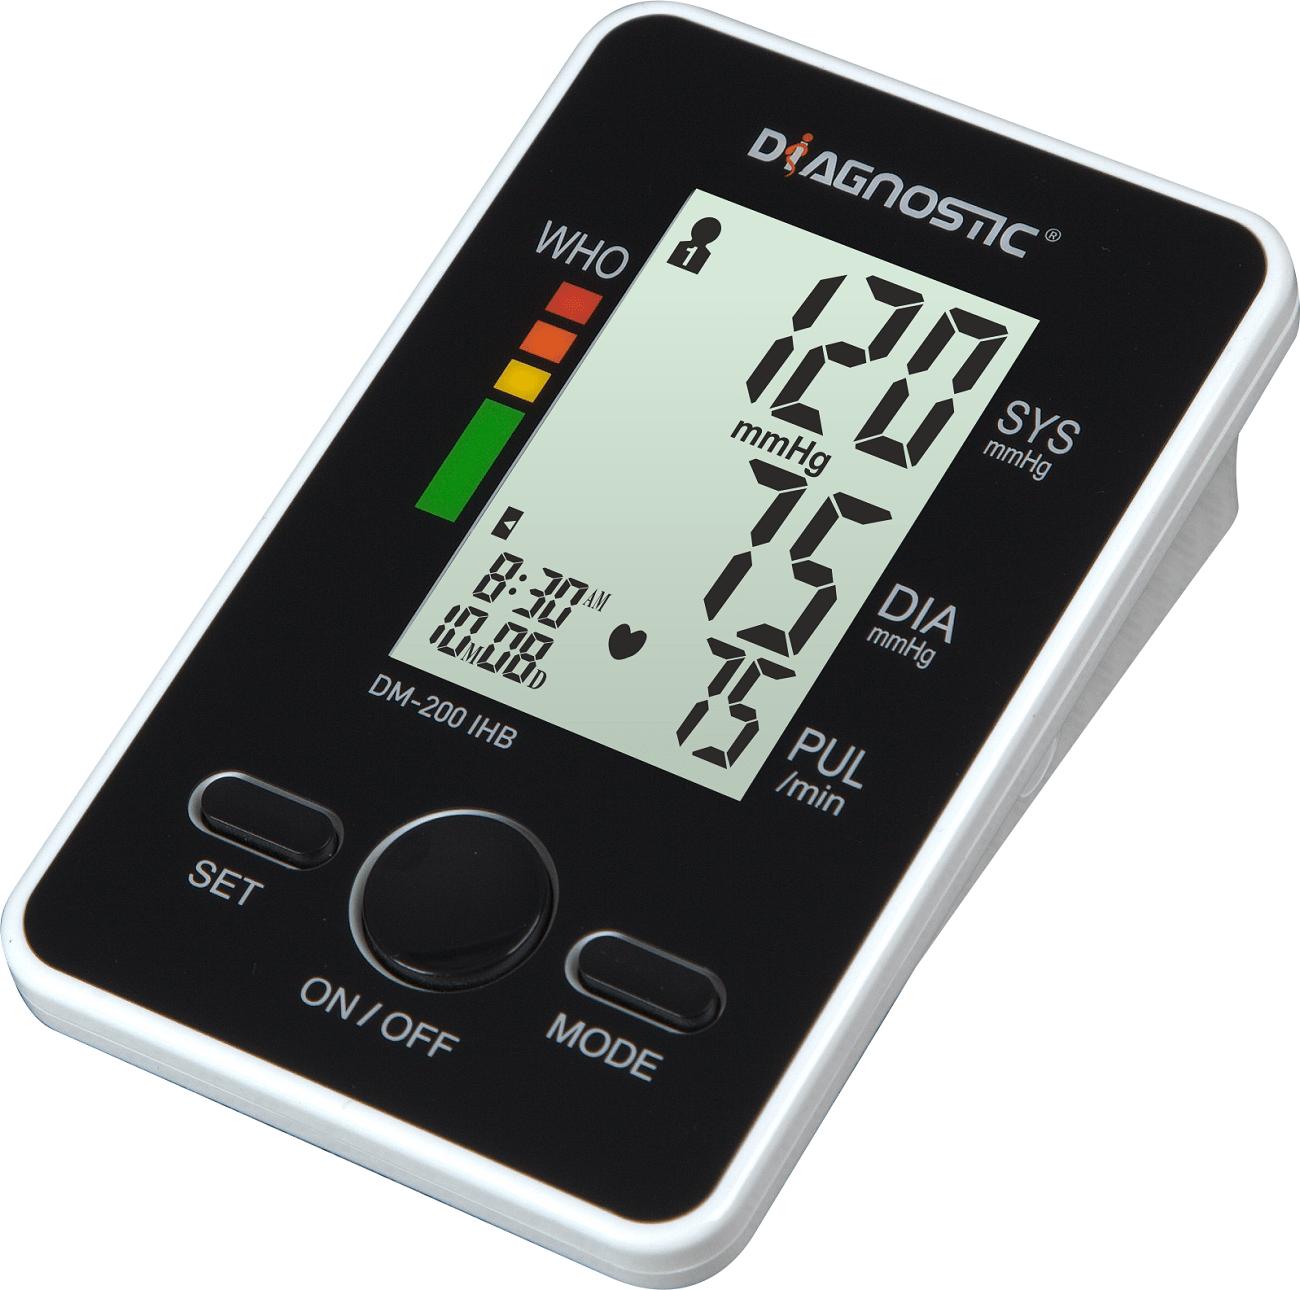 Ciśnieniomierz Diagnostic DM-200 IHB